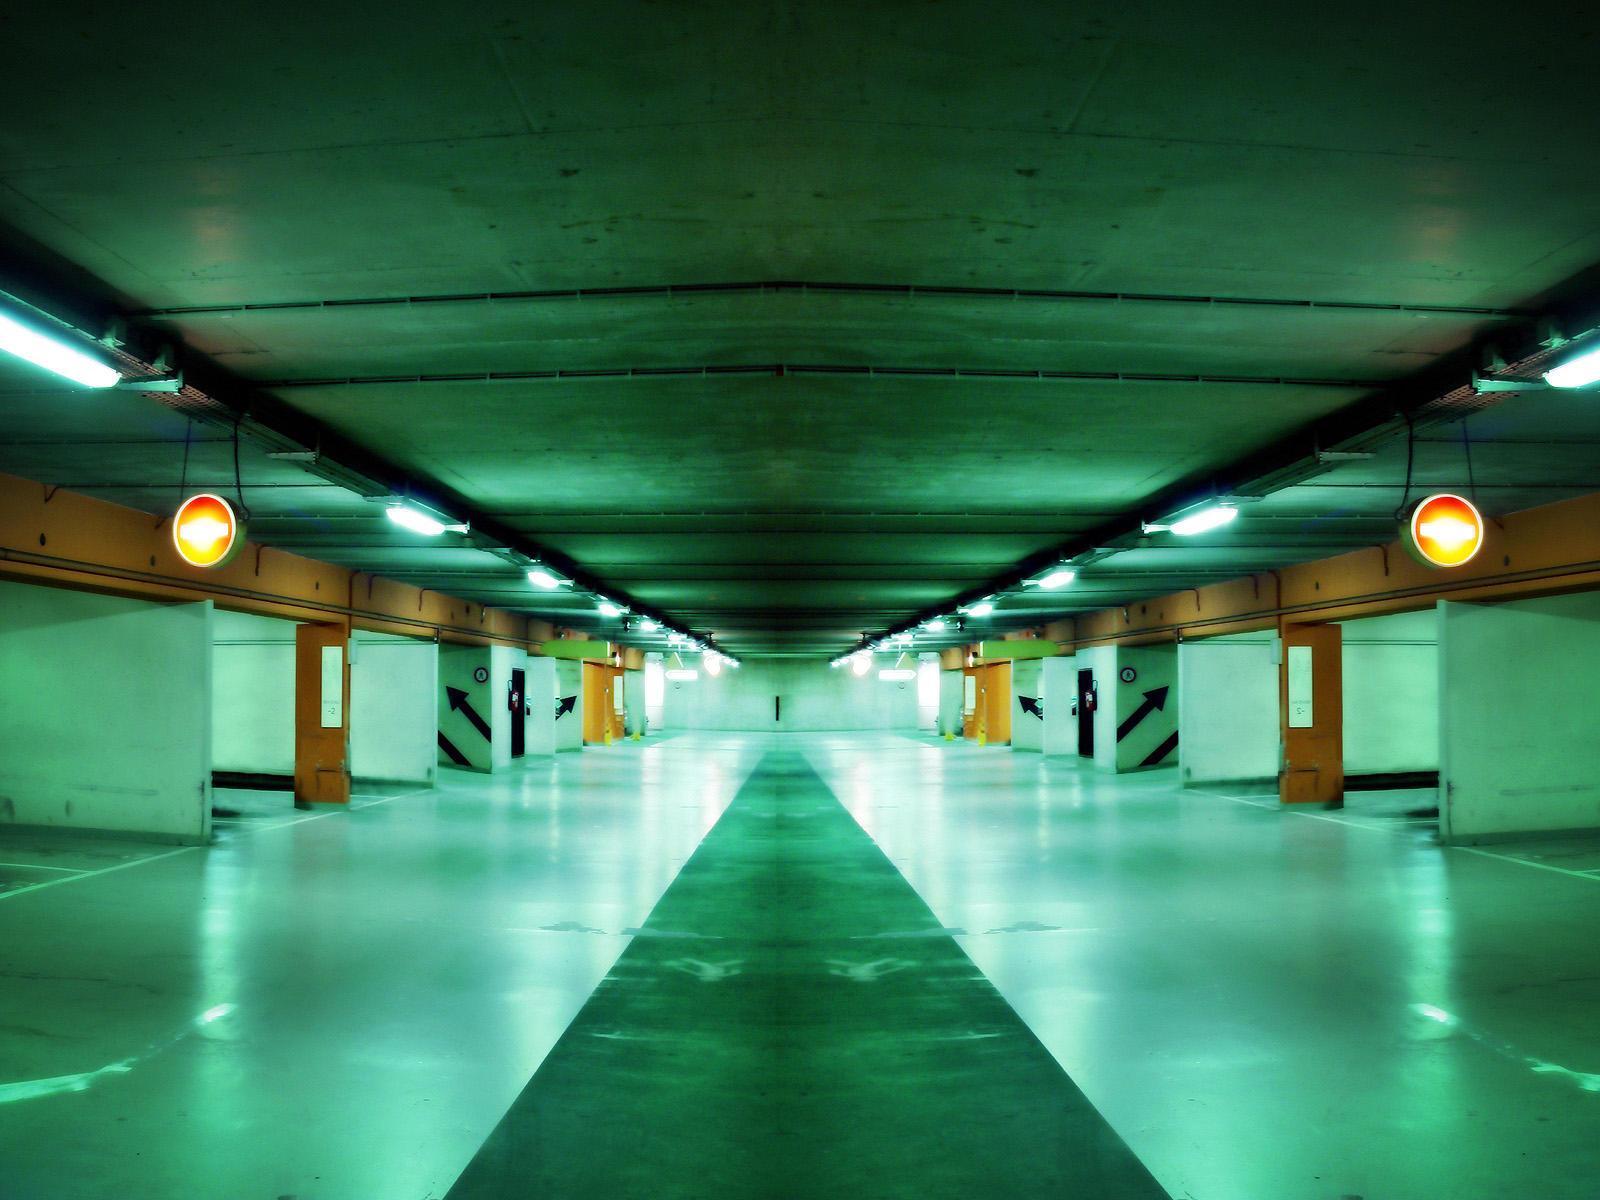 underground-02 by brujo